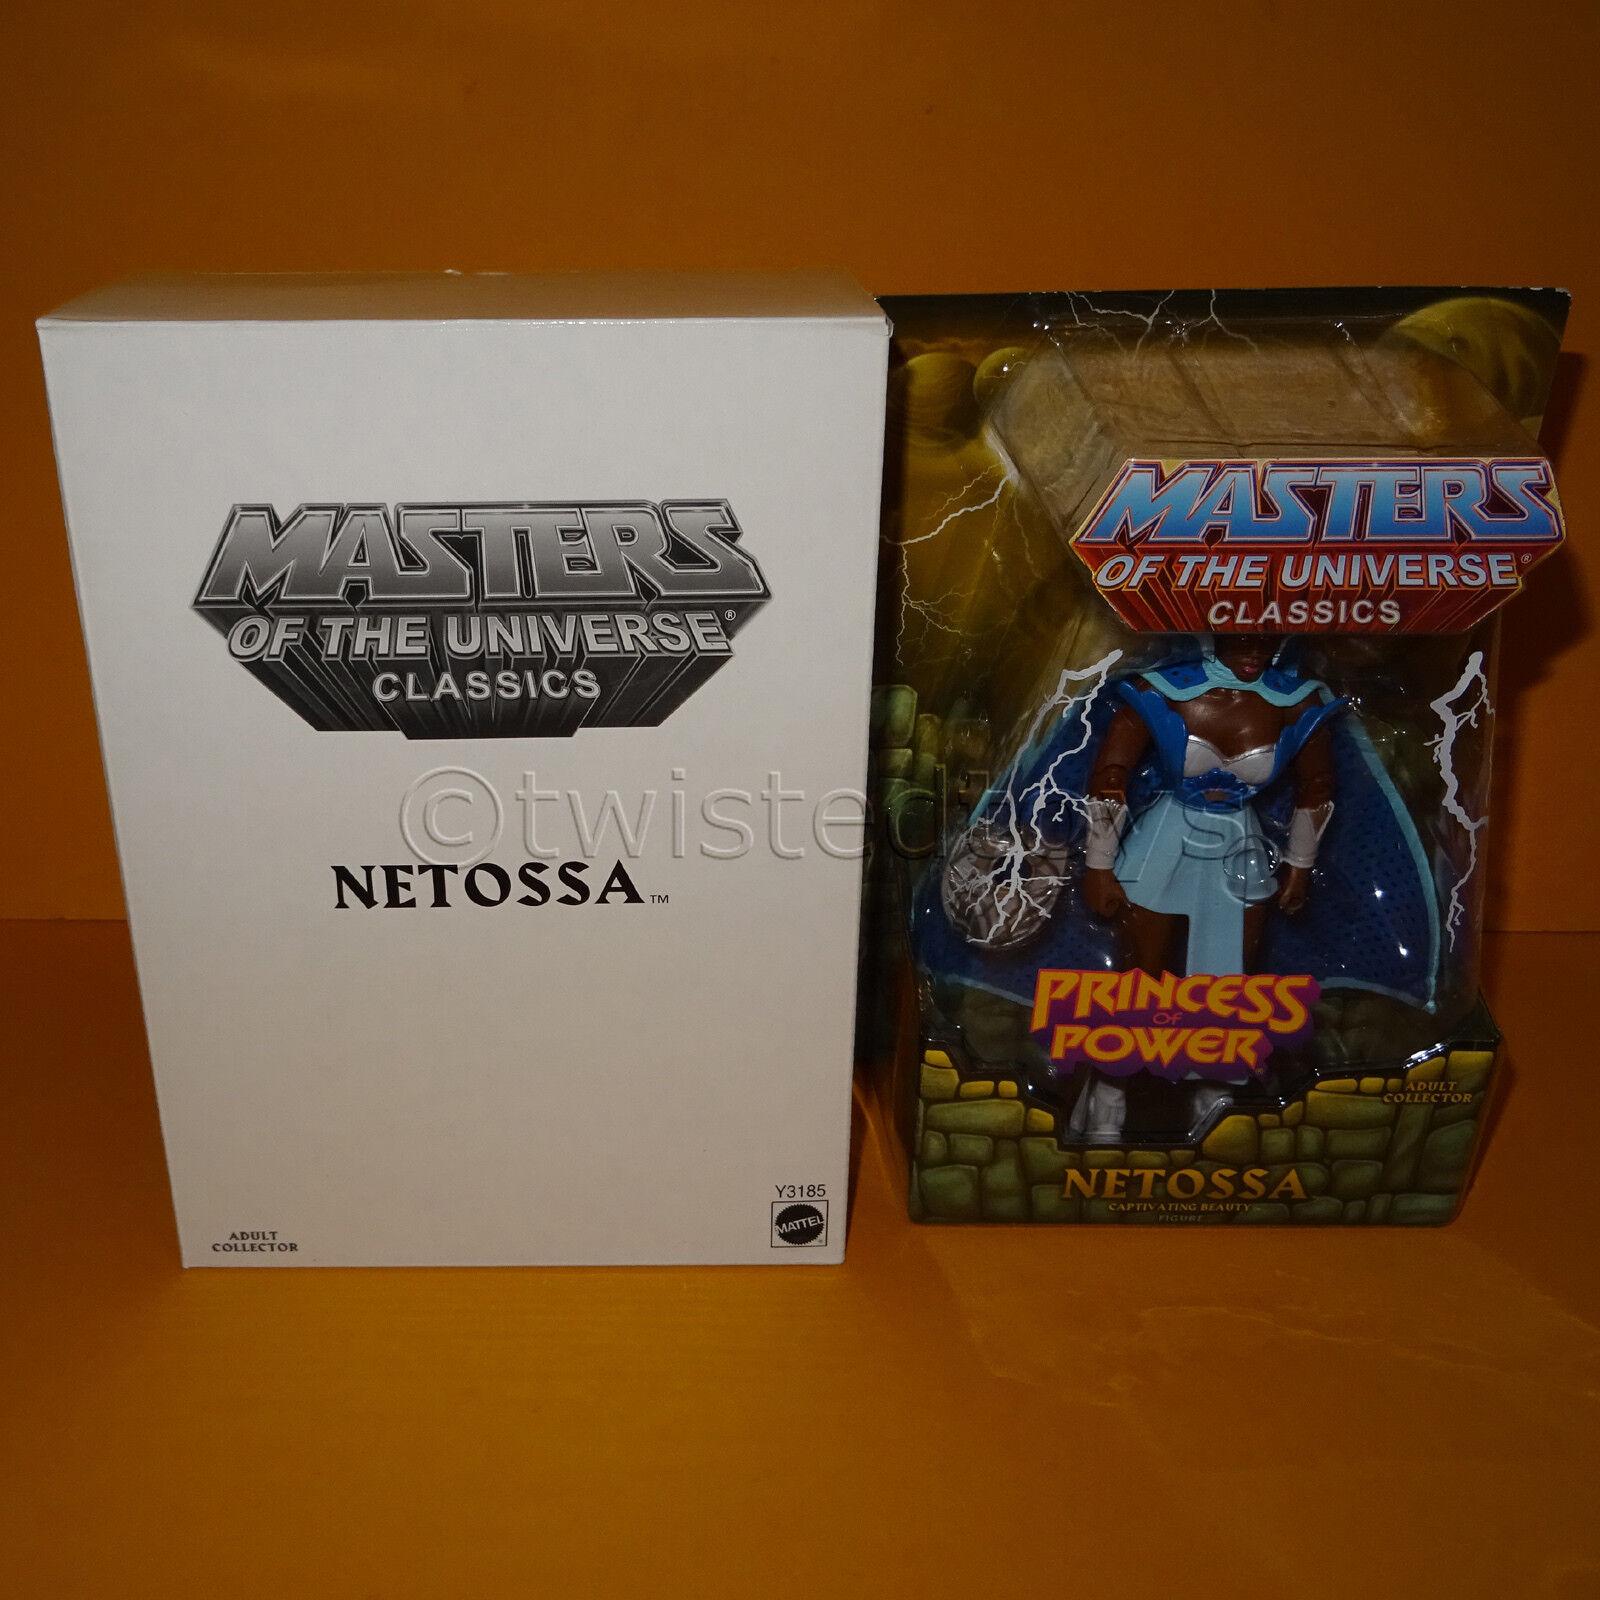 2012 MATTEL Amos del universo He-Man Masters Of The Universe Classics Netossa (She-ra) MOC